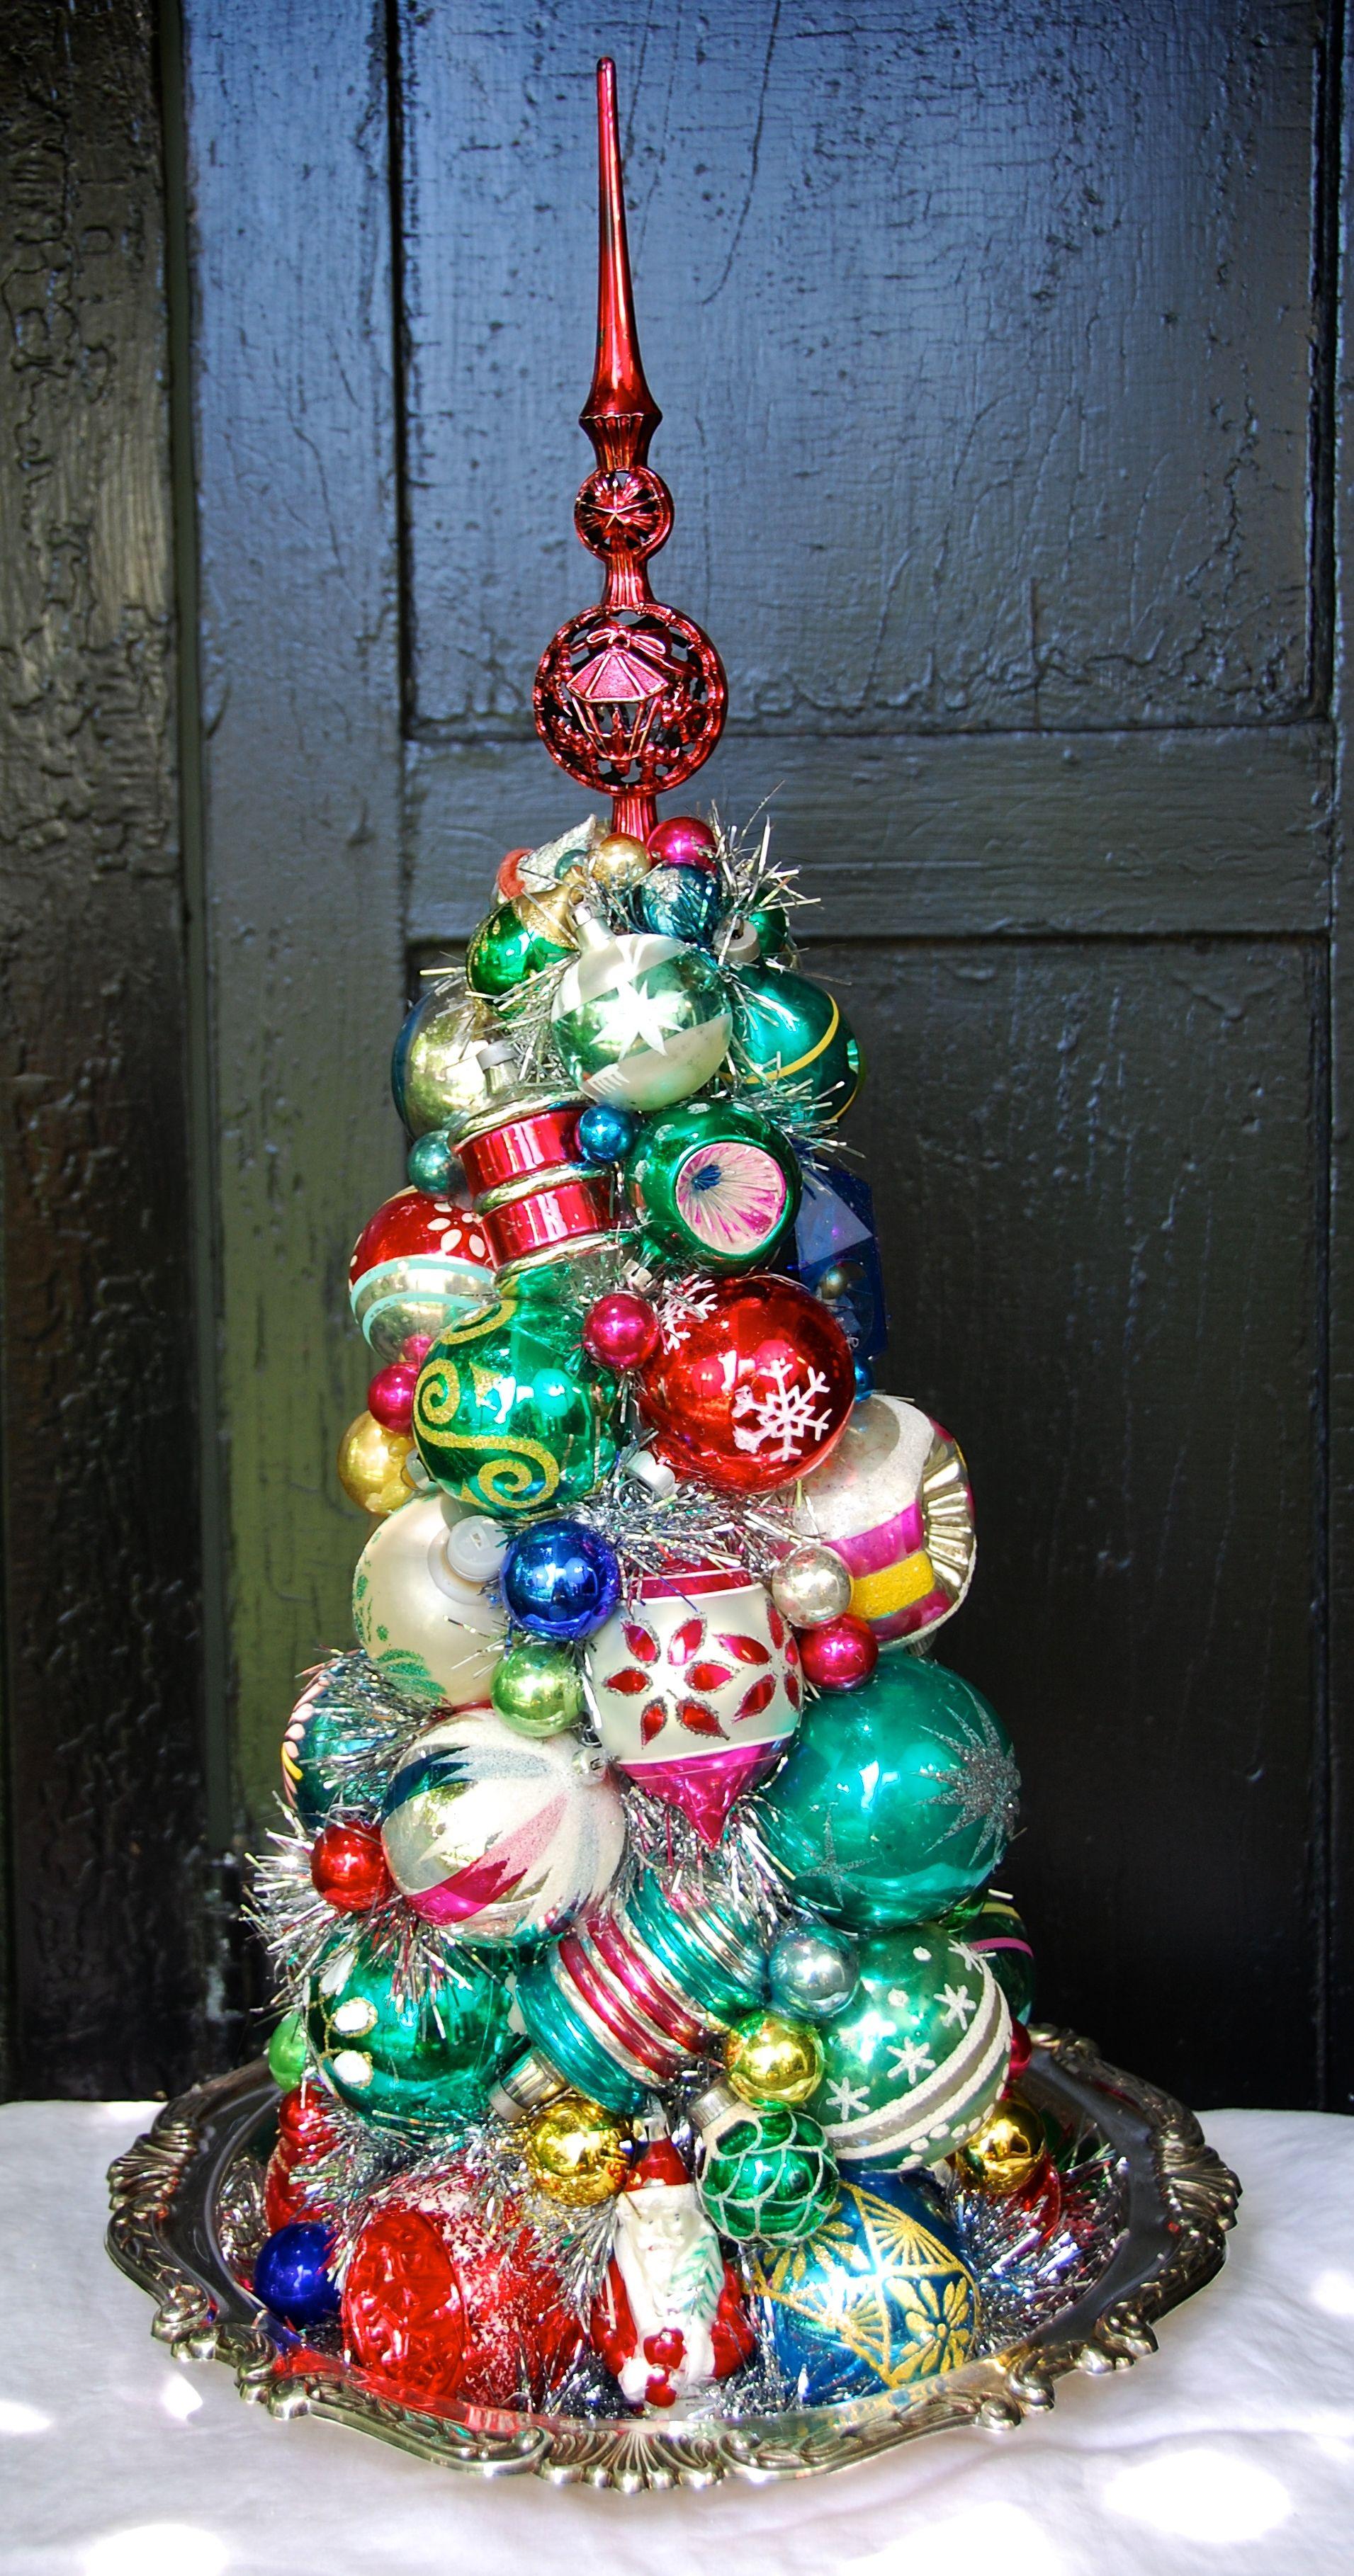 "Holiday Inn 241/2"" Tall 250 Christmas Pinterest"